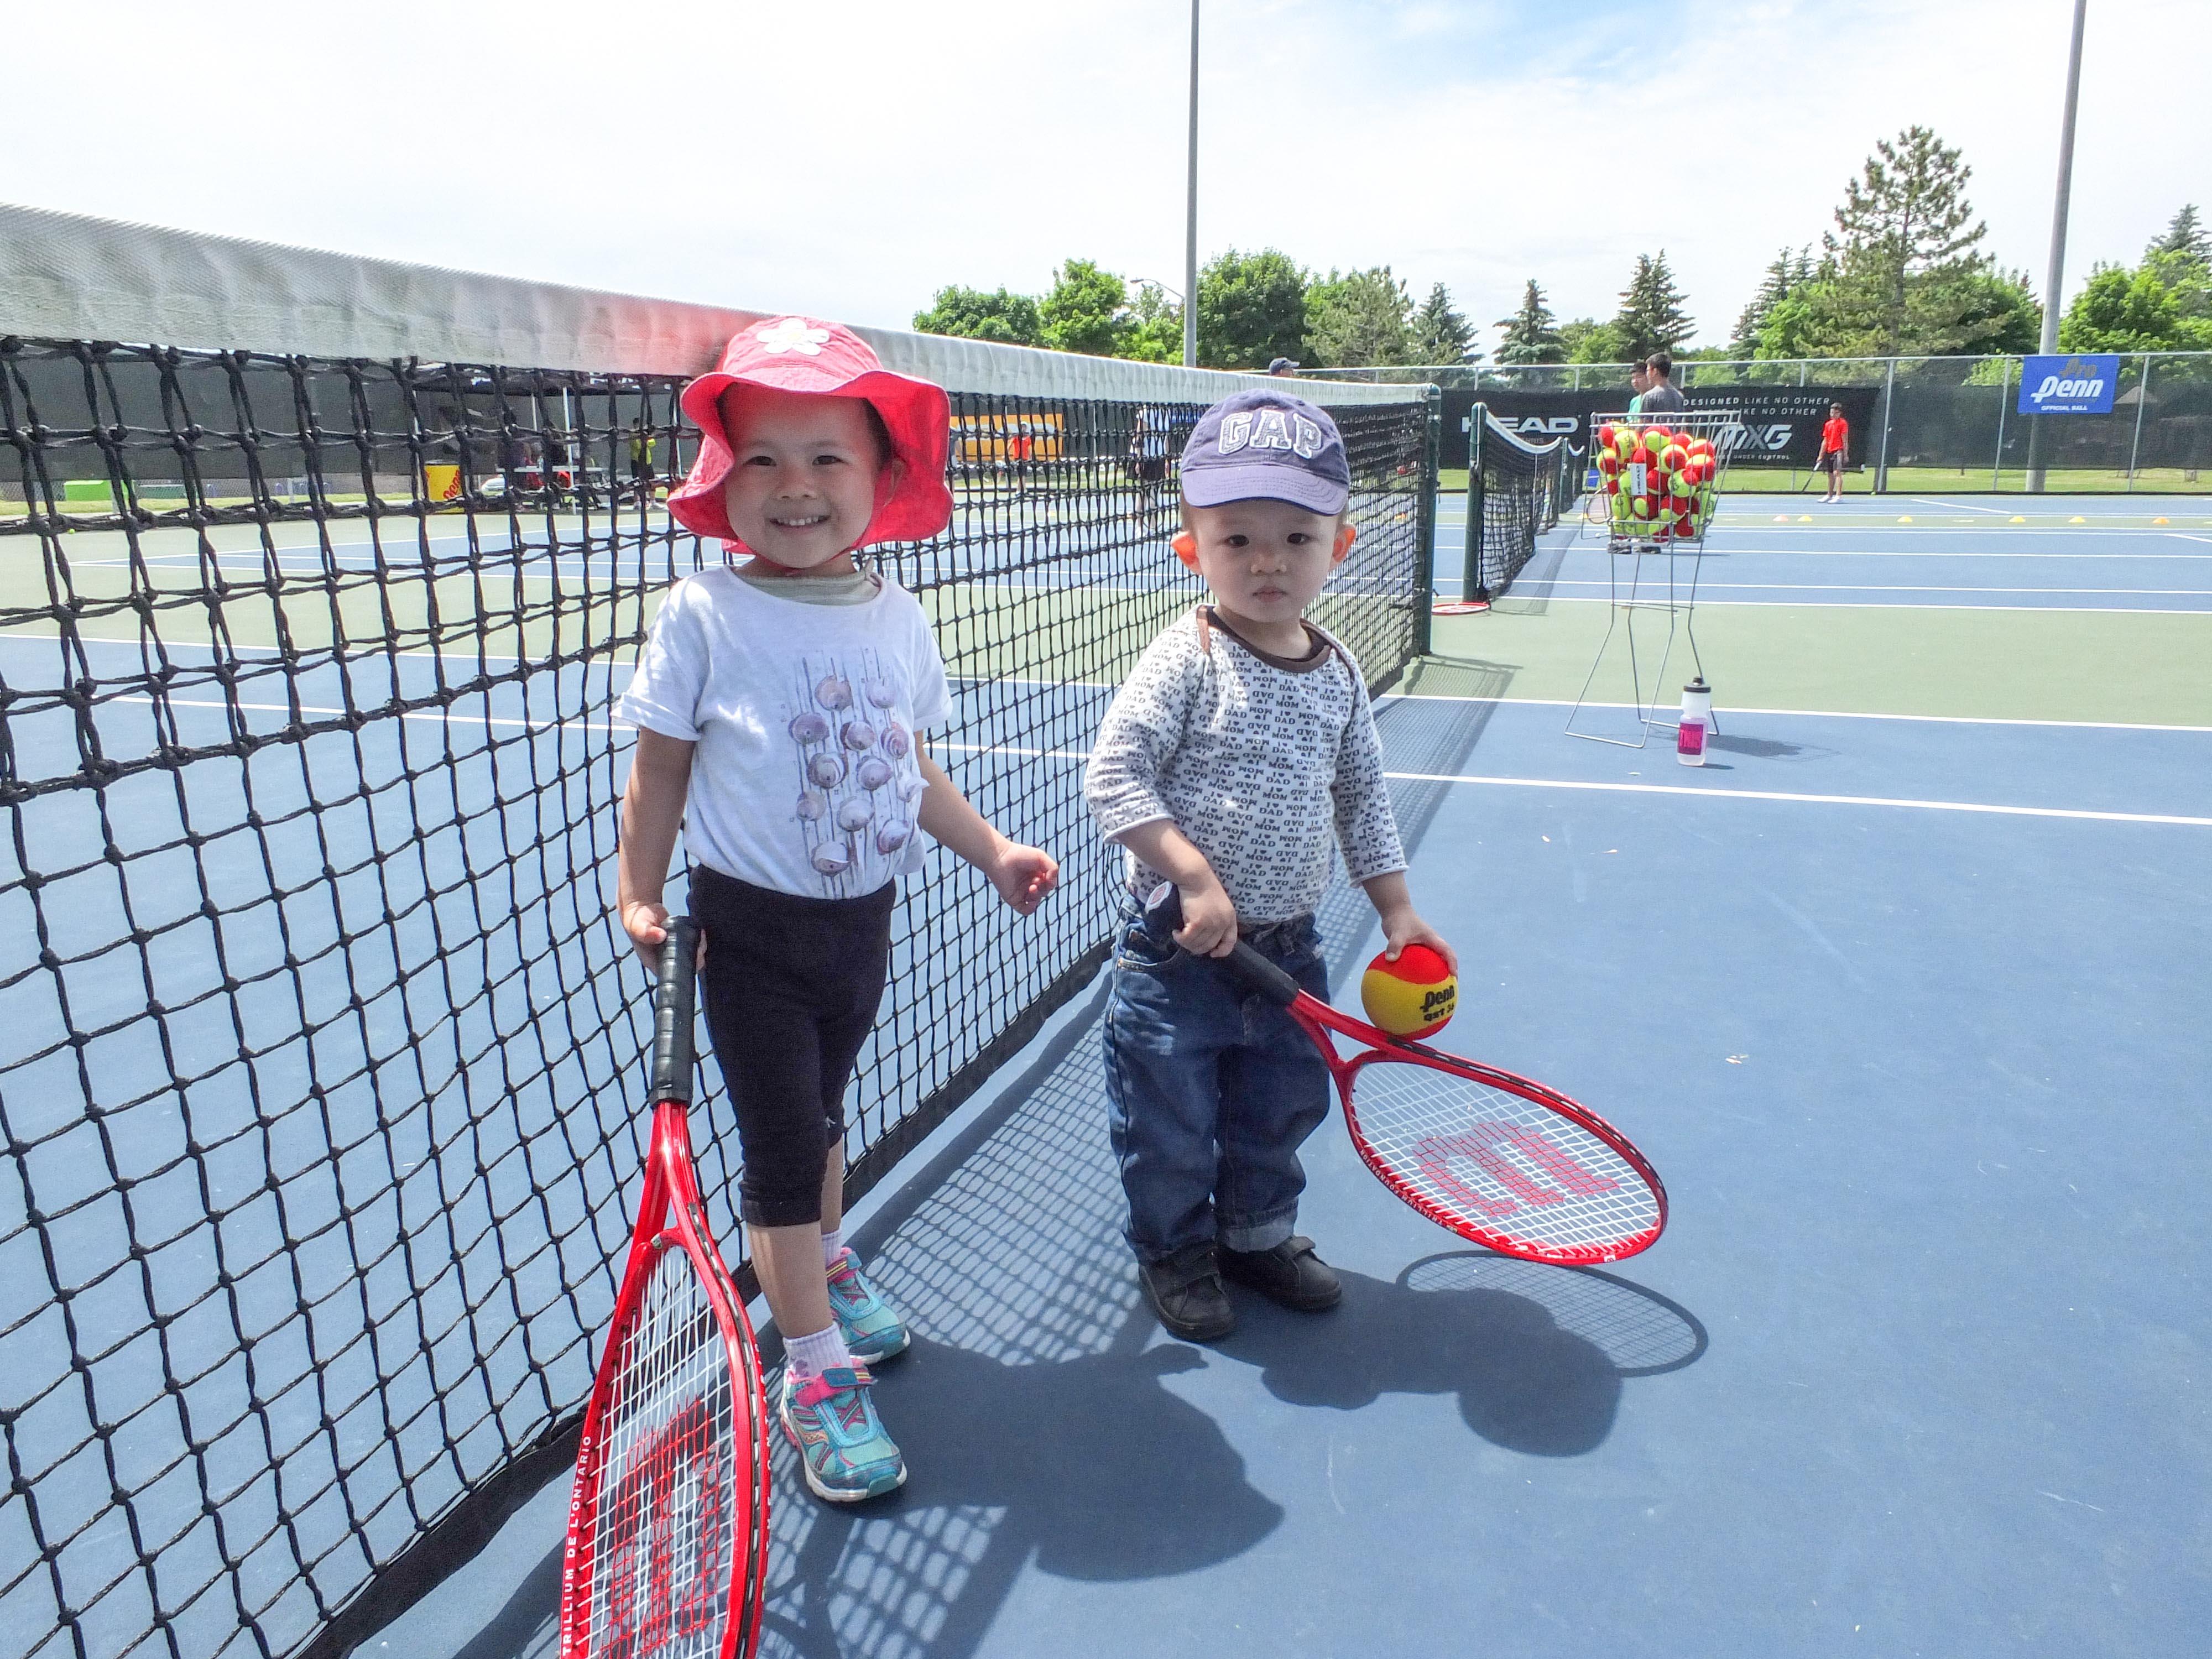 Emerald & Everett Play Tennis